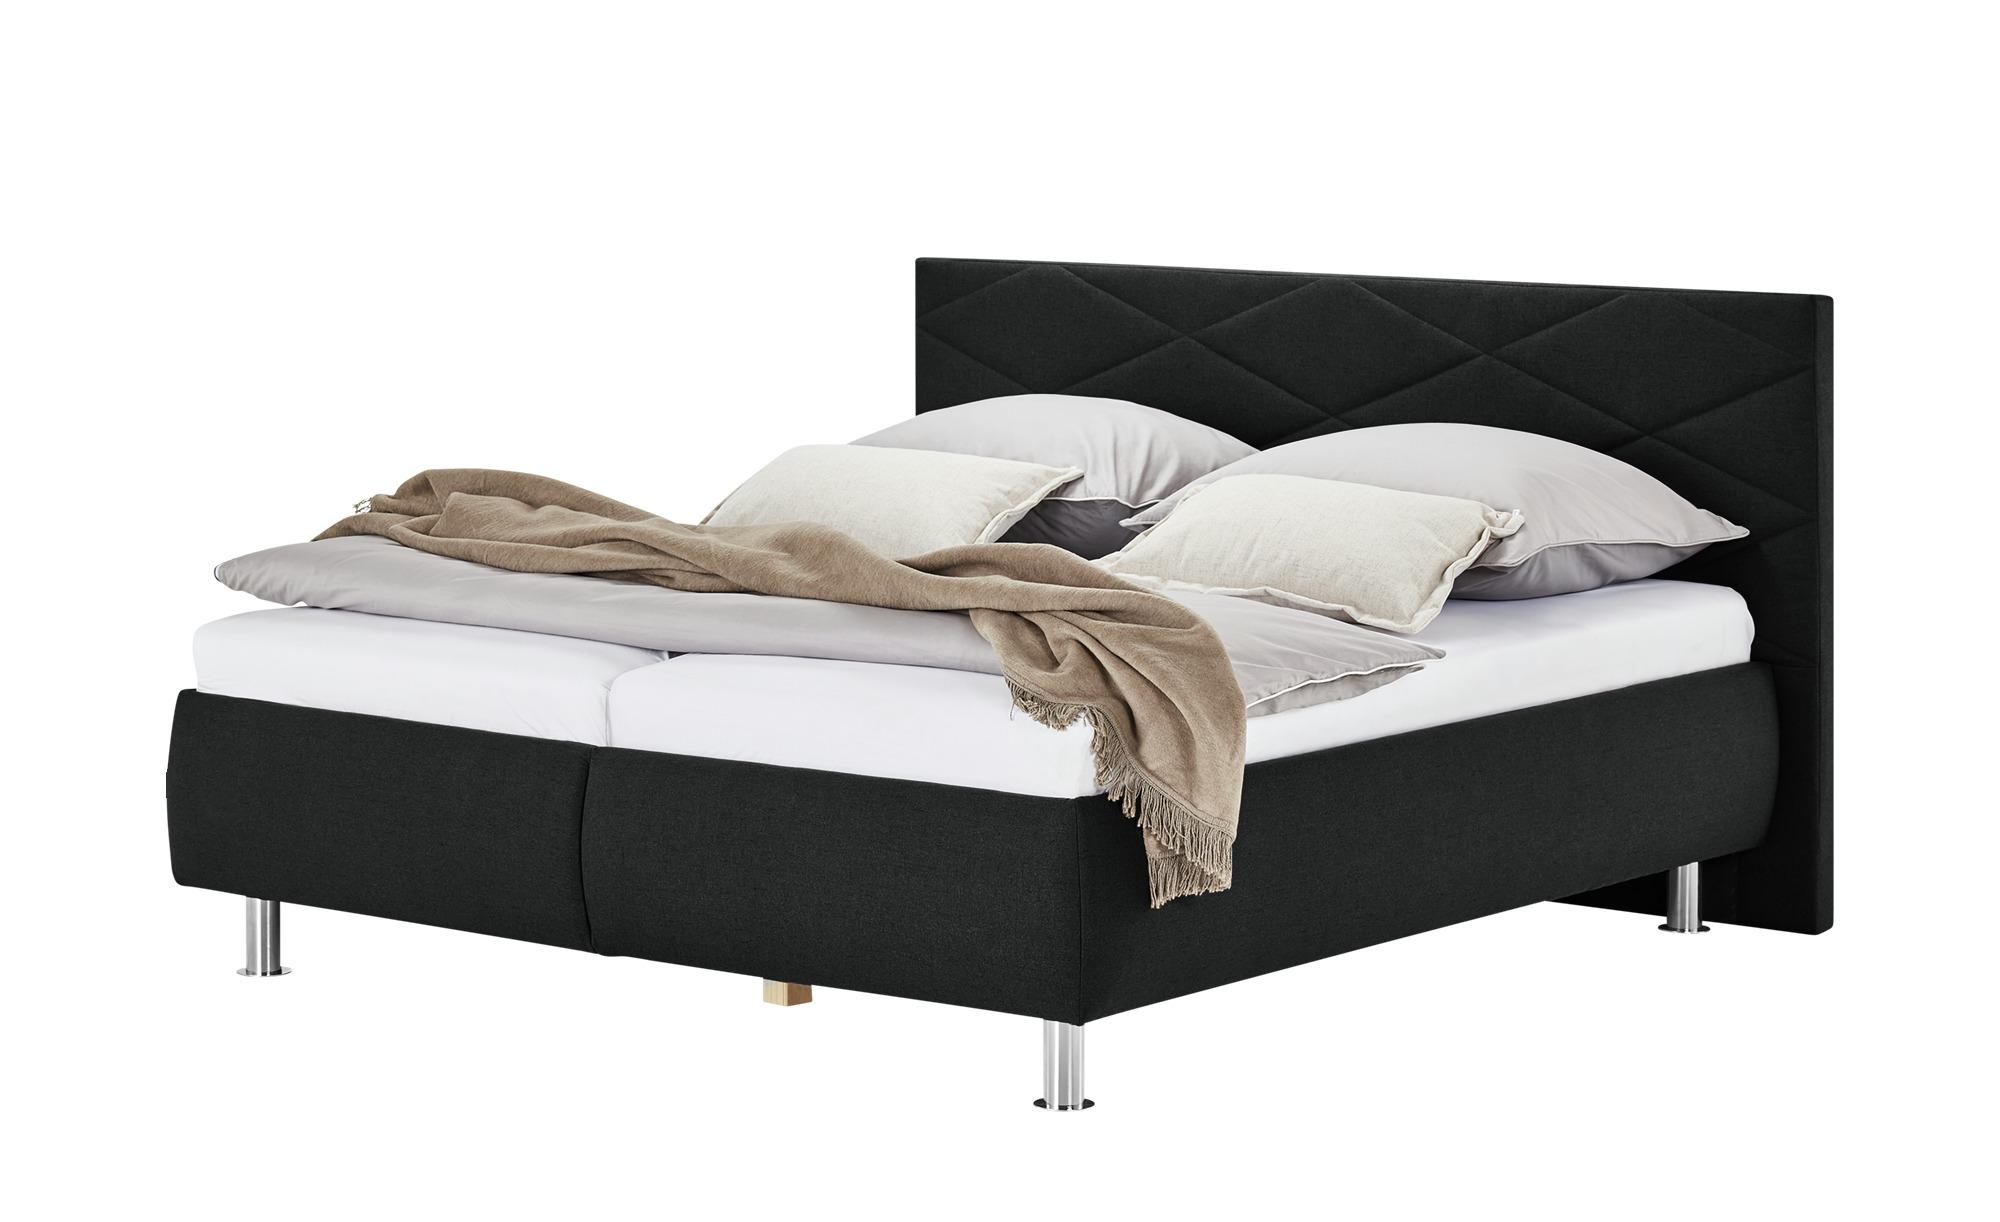 Polsterbett  Kos ¦ schwarz ¦ Maße (cm): B: 180 H: 112 Betten > Polsterbetten - Höffner